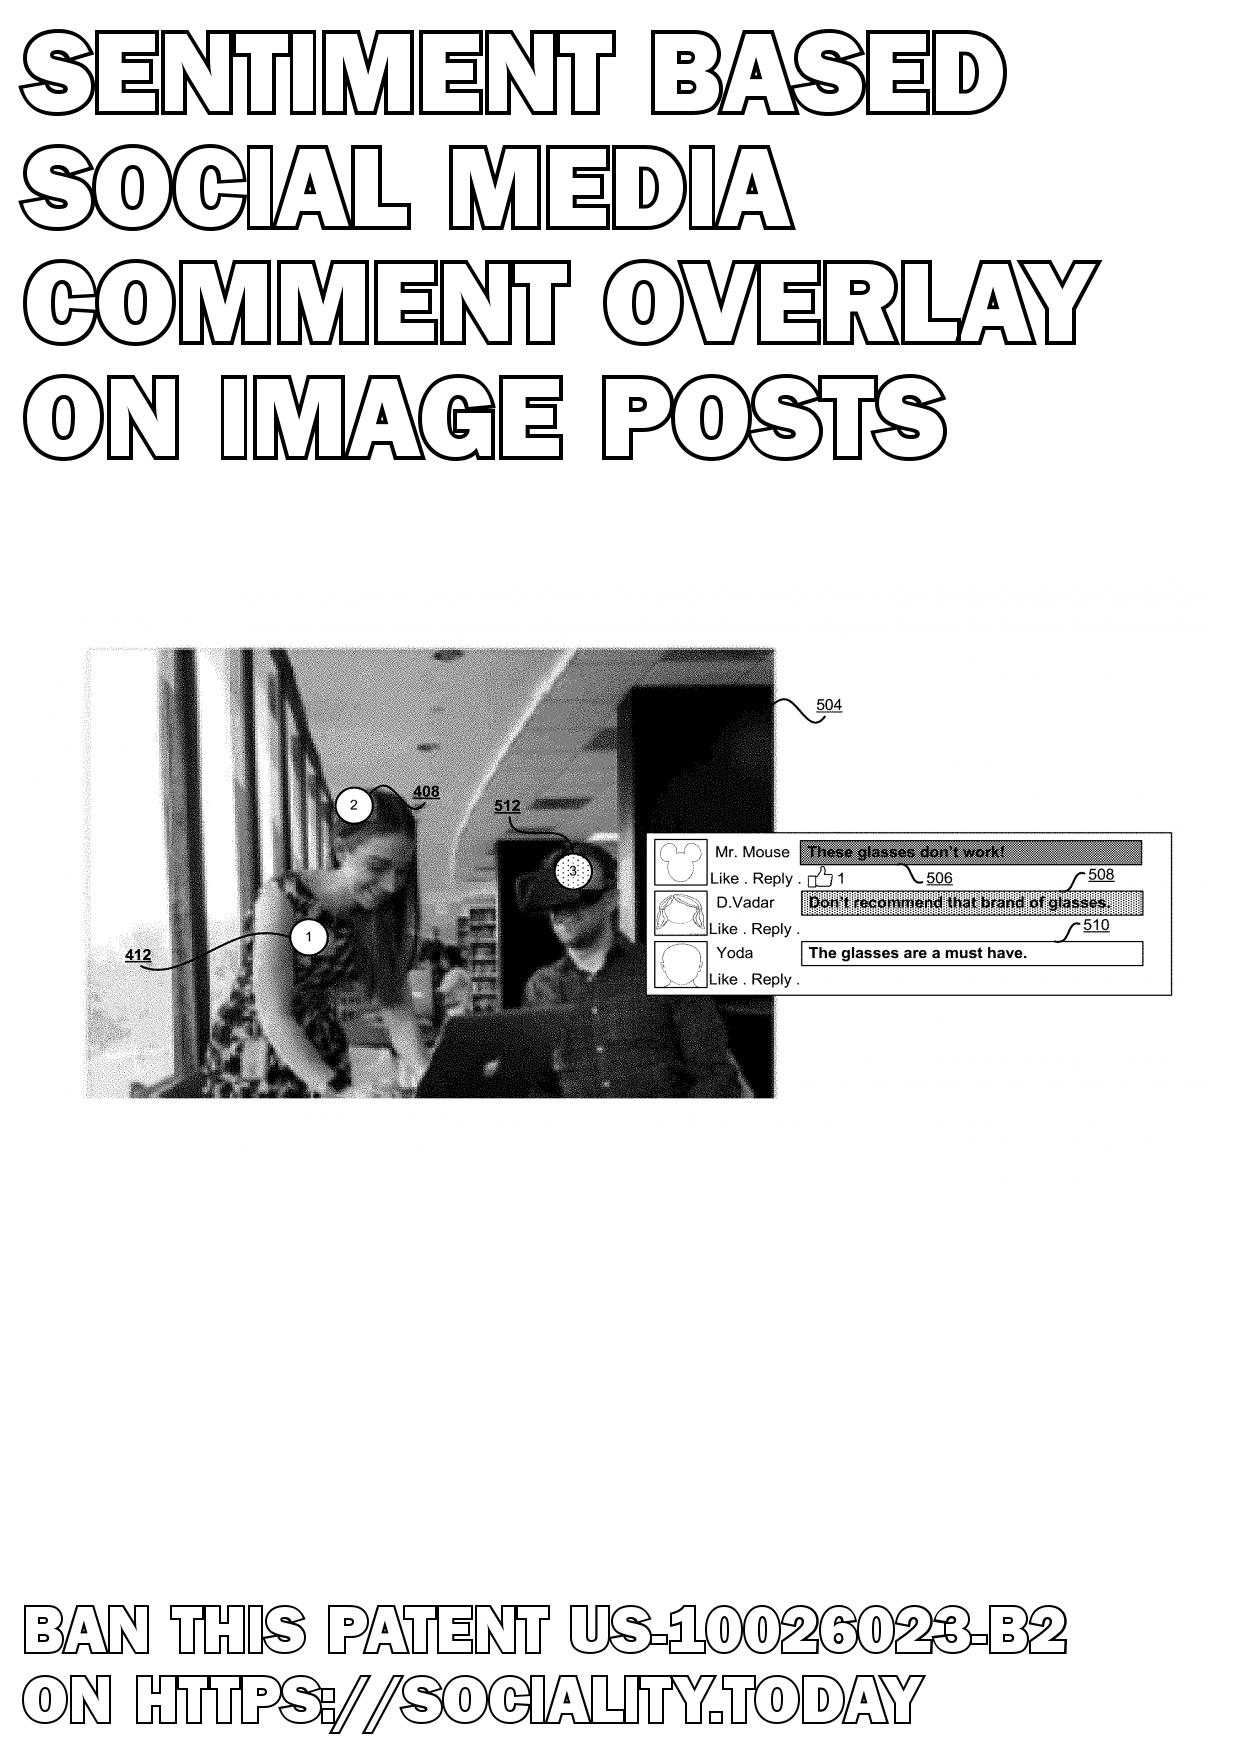 Sentiment based social media comment overlay on image posts  - US-10026023-B2